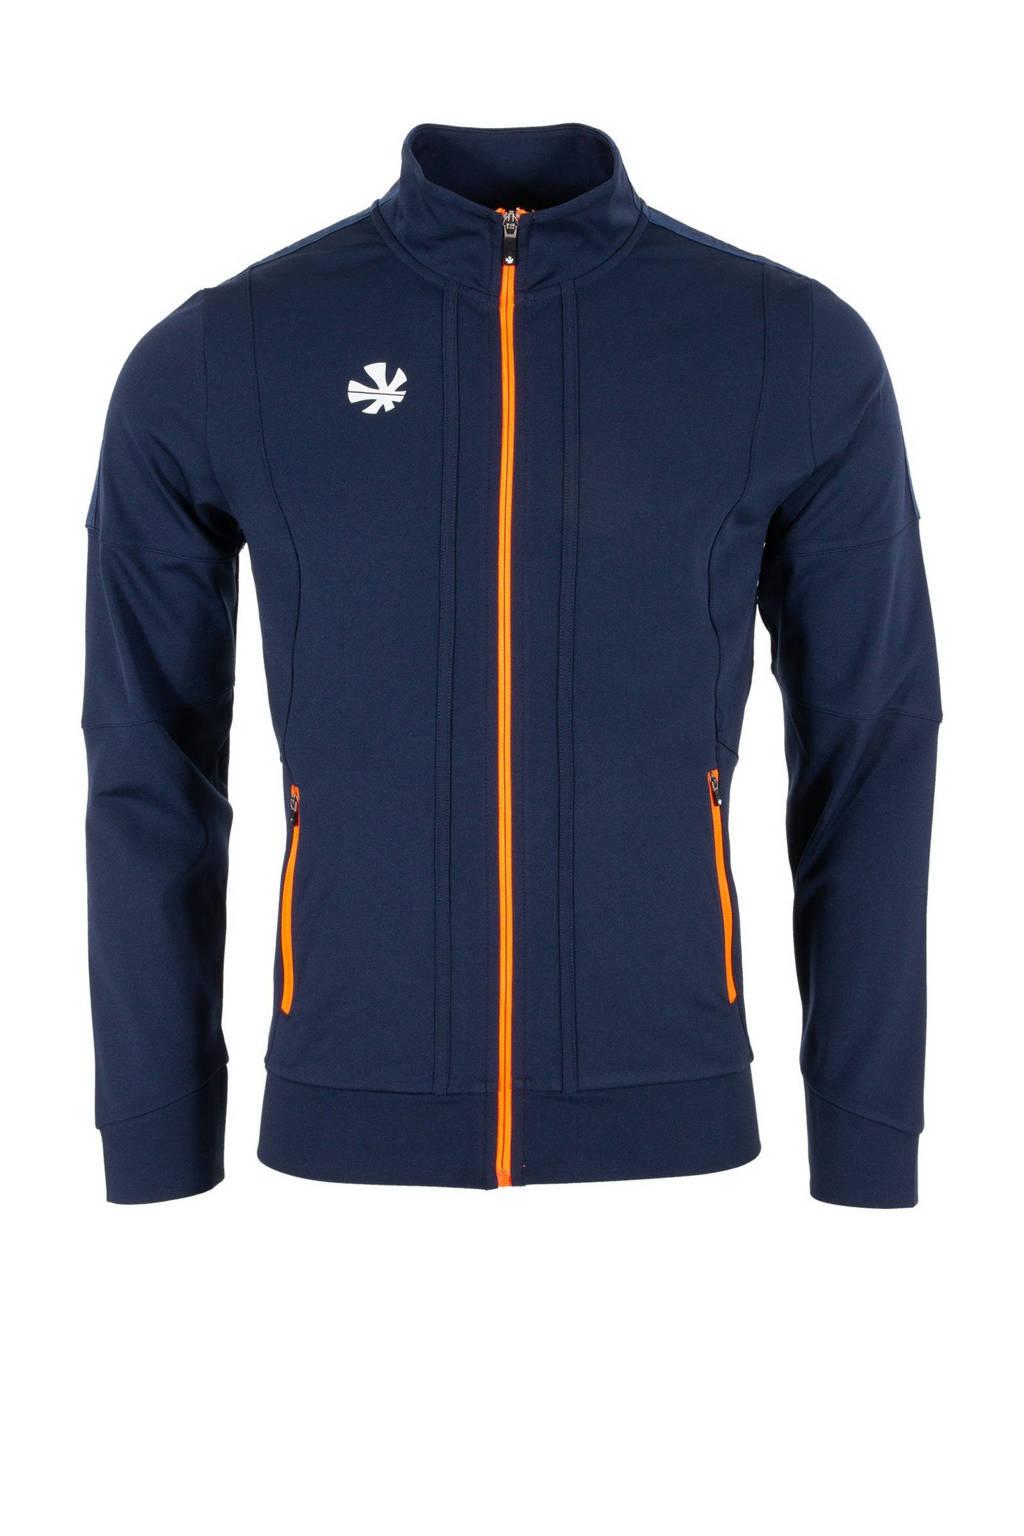 Reece Australia sportvest donkerblauw/oranje, Donkerblauw/oranje